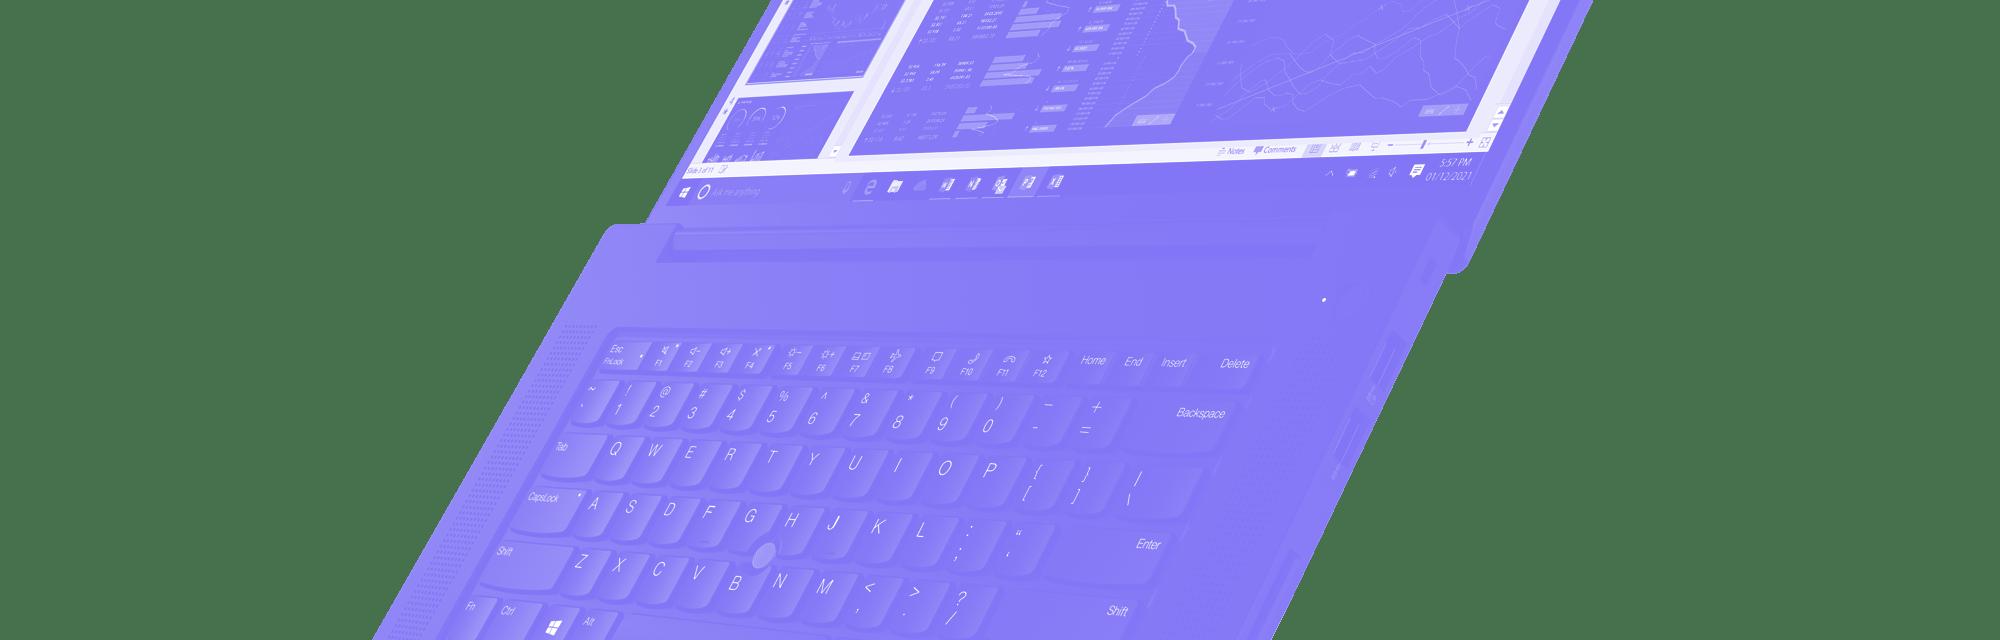 Lenovo ThinkPad X1 Extreme Gen 4 with RTX 3080 mobile GPU